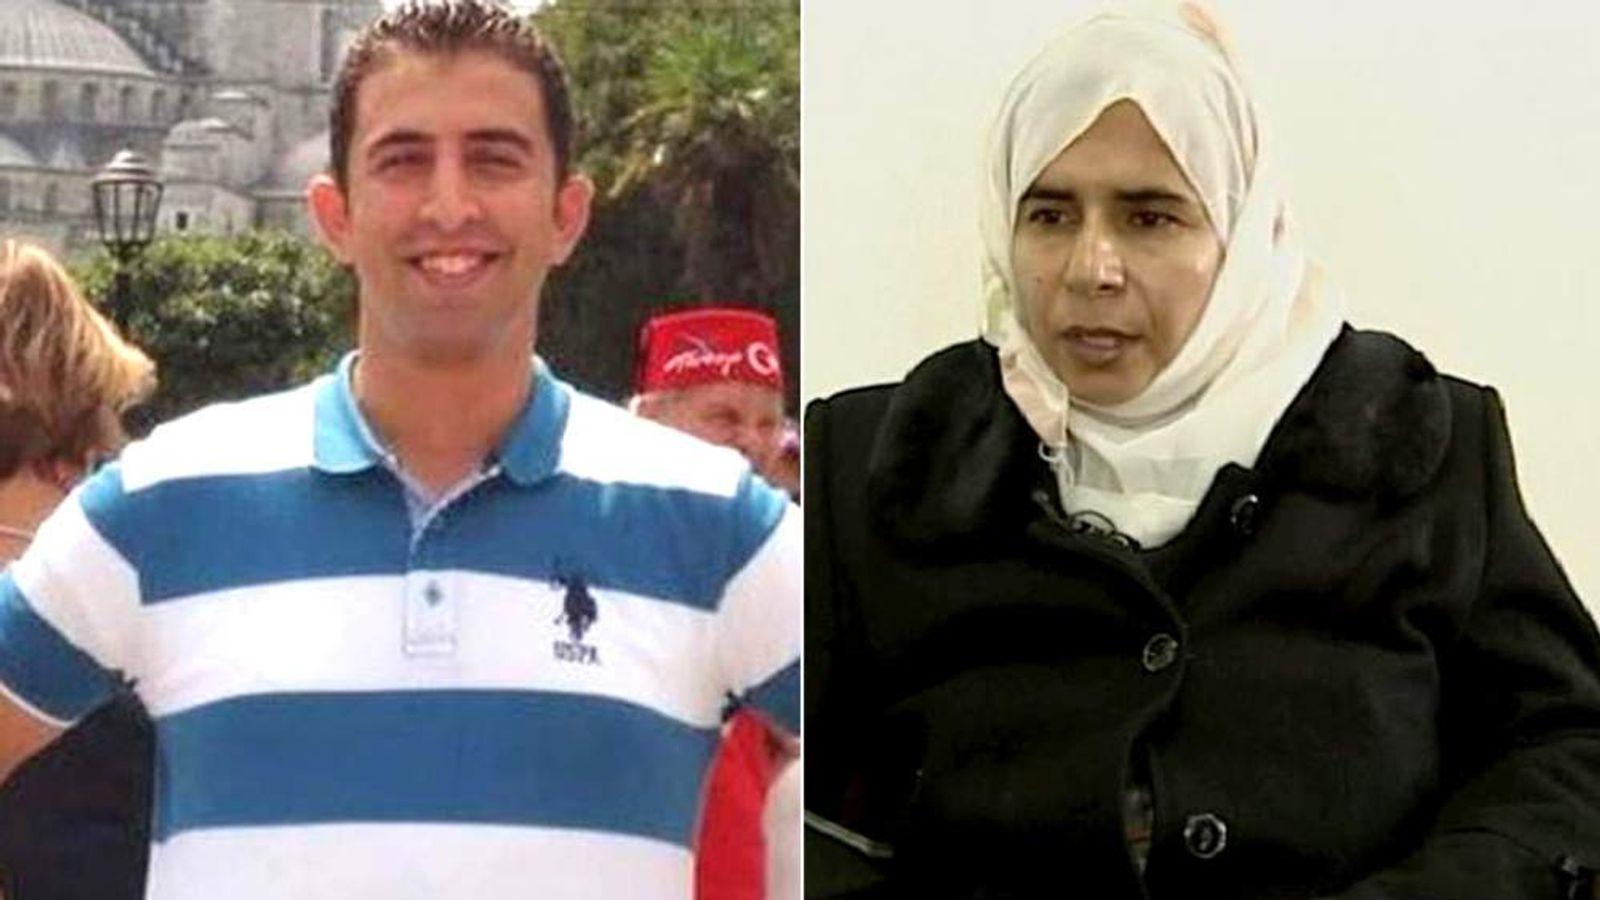 First Lieutenant Muath al Kasaesbeh & attempted suicide bomber Sajida al Rishawi